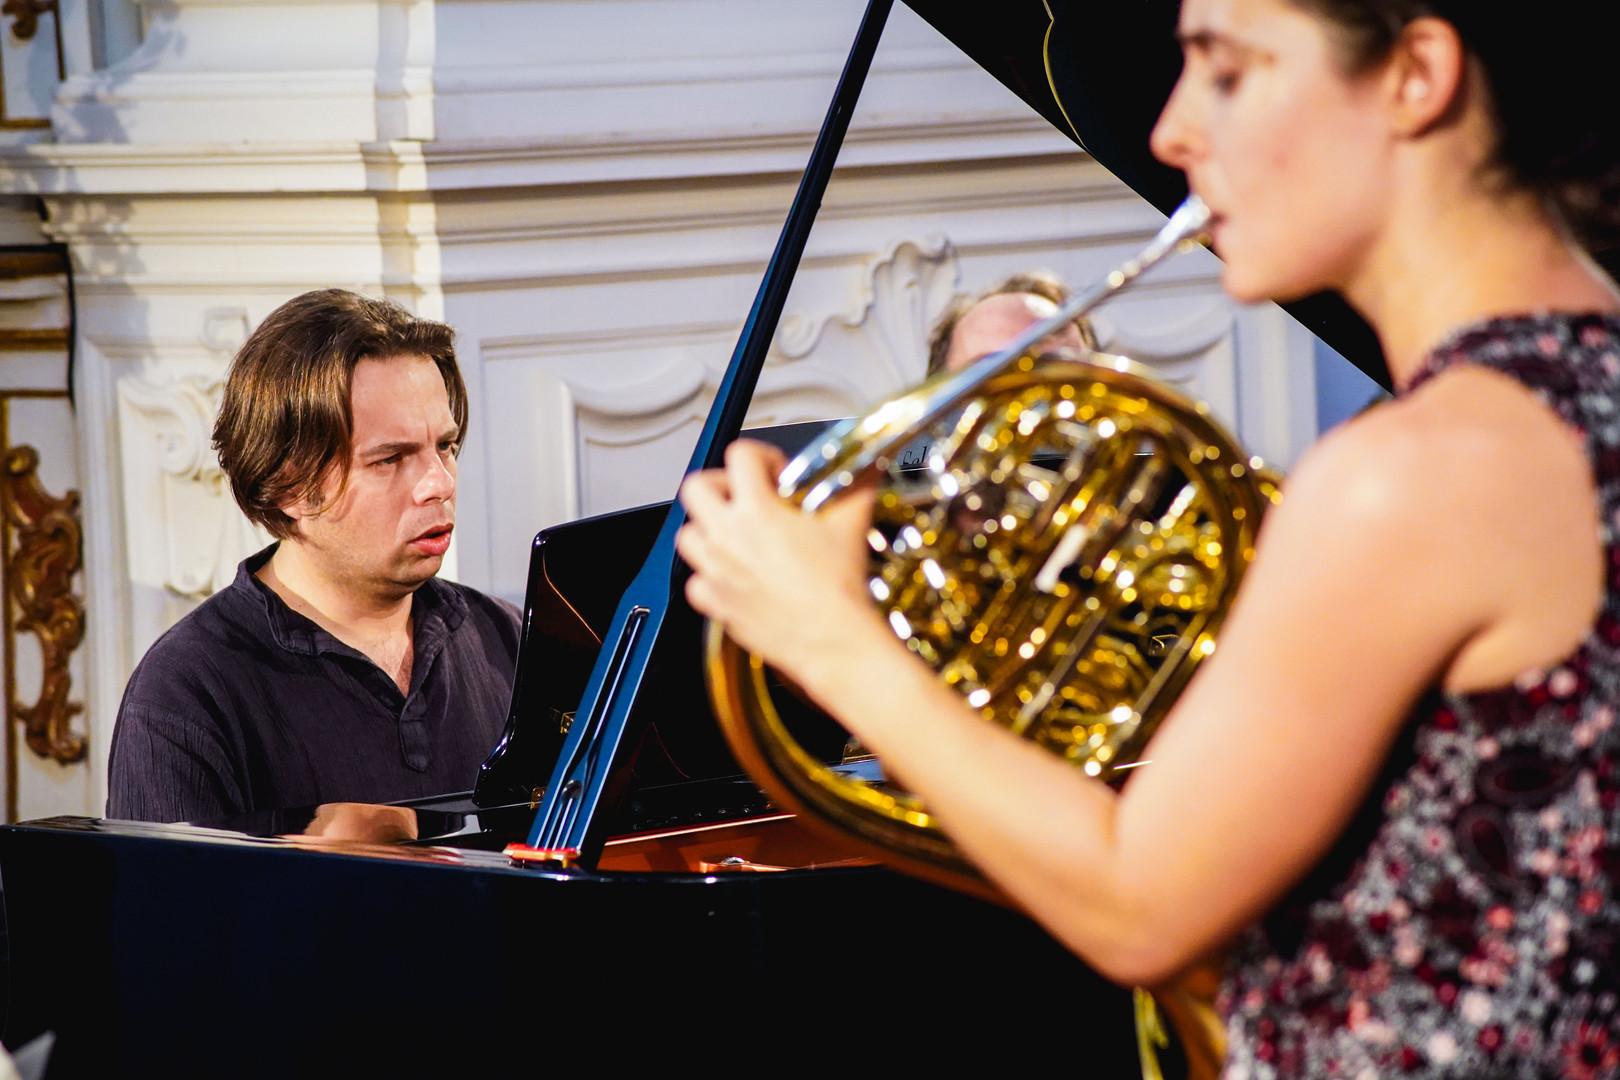 concerto-obras-de-r-schumann-e-j-brahms_